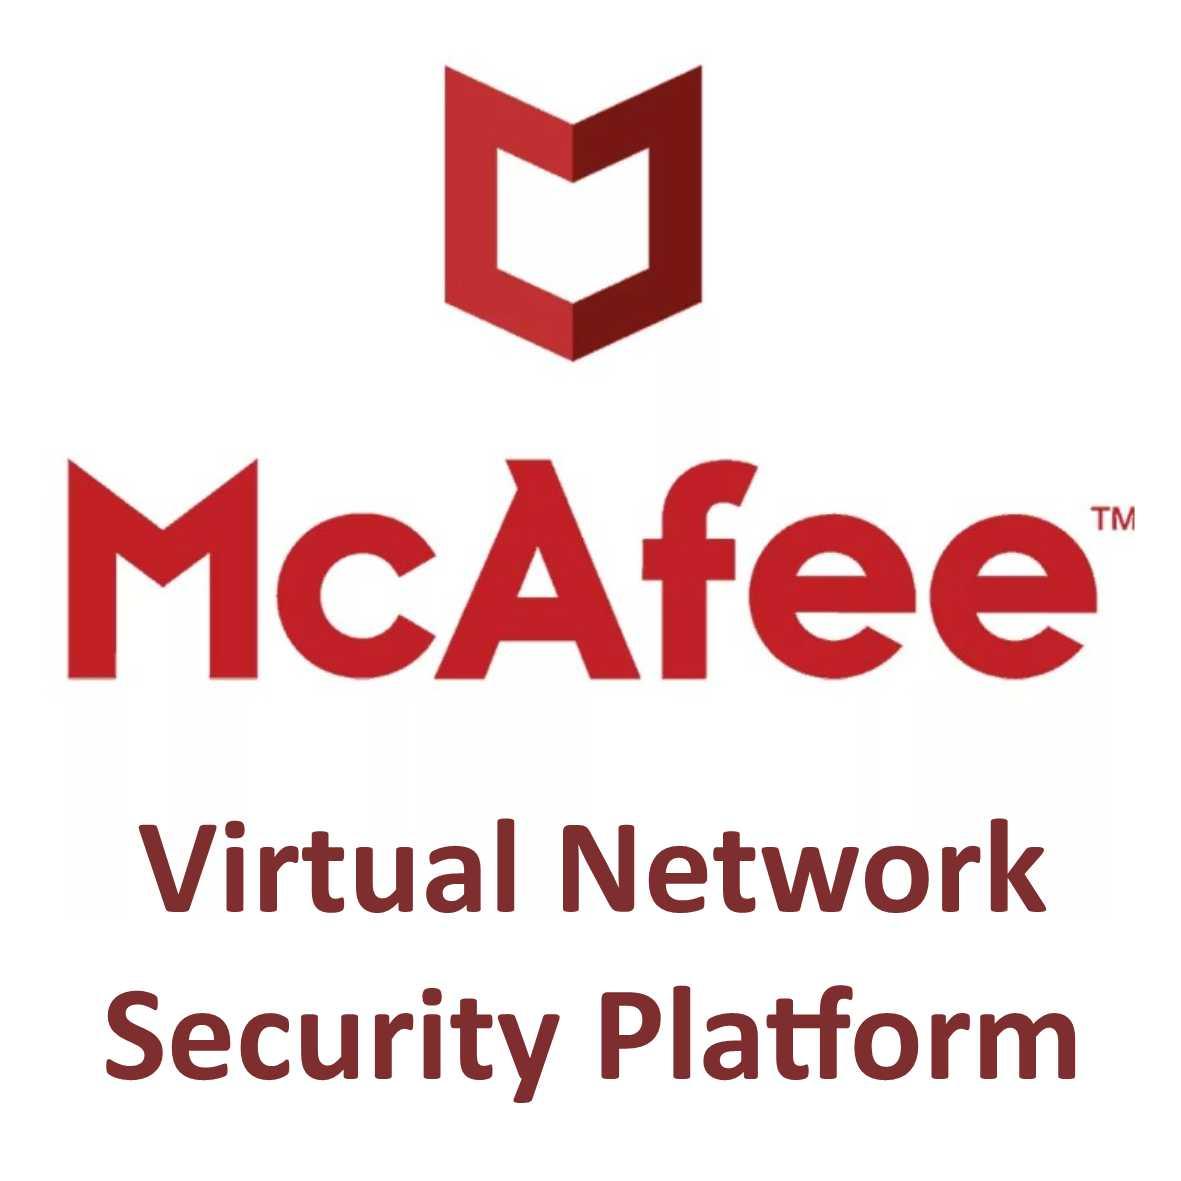 McAfee Virtual Network Security Platform